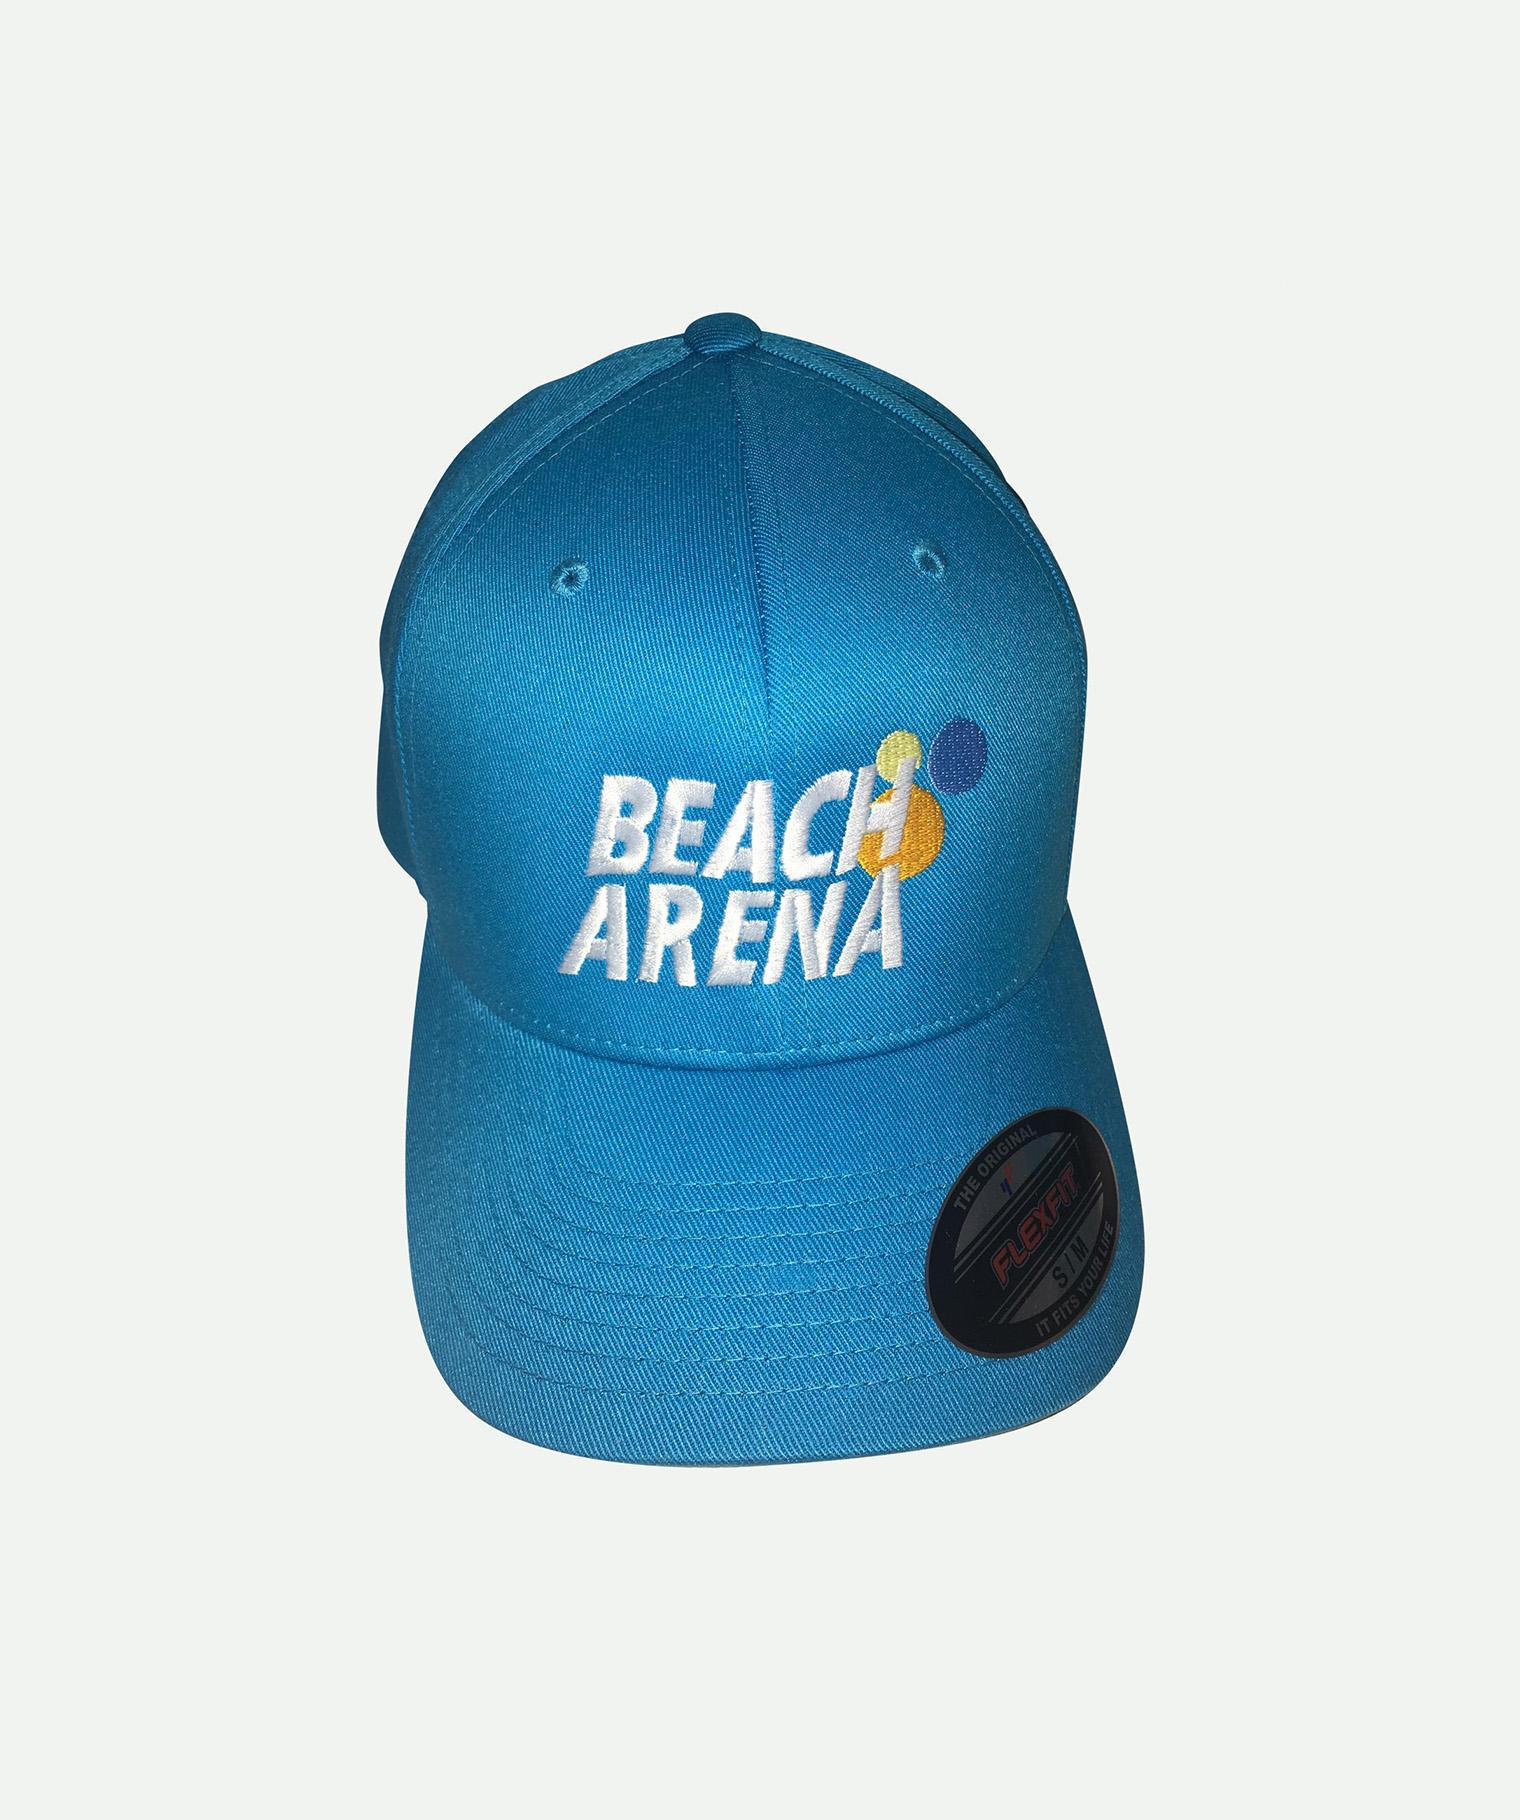 Gorra bordada flexfit azul